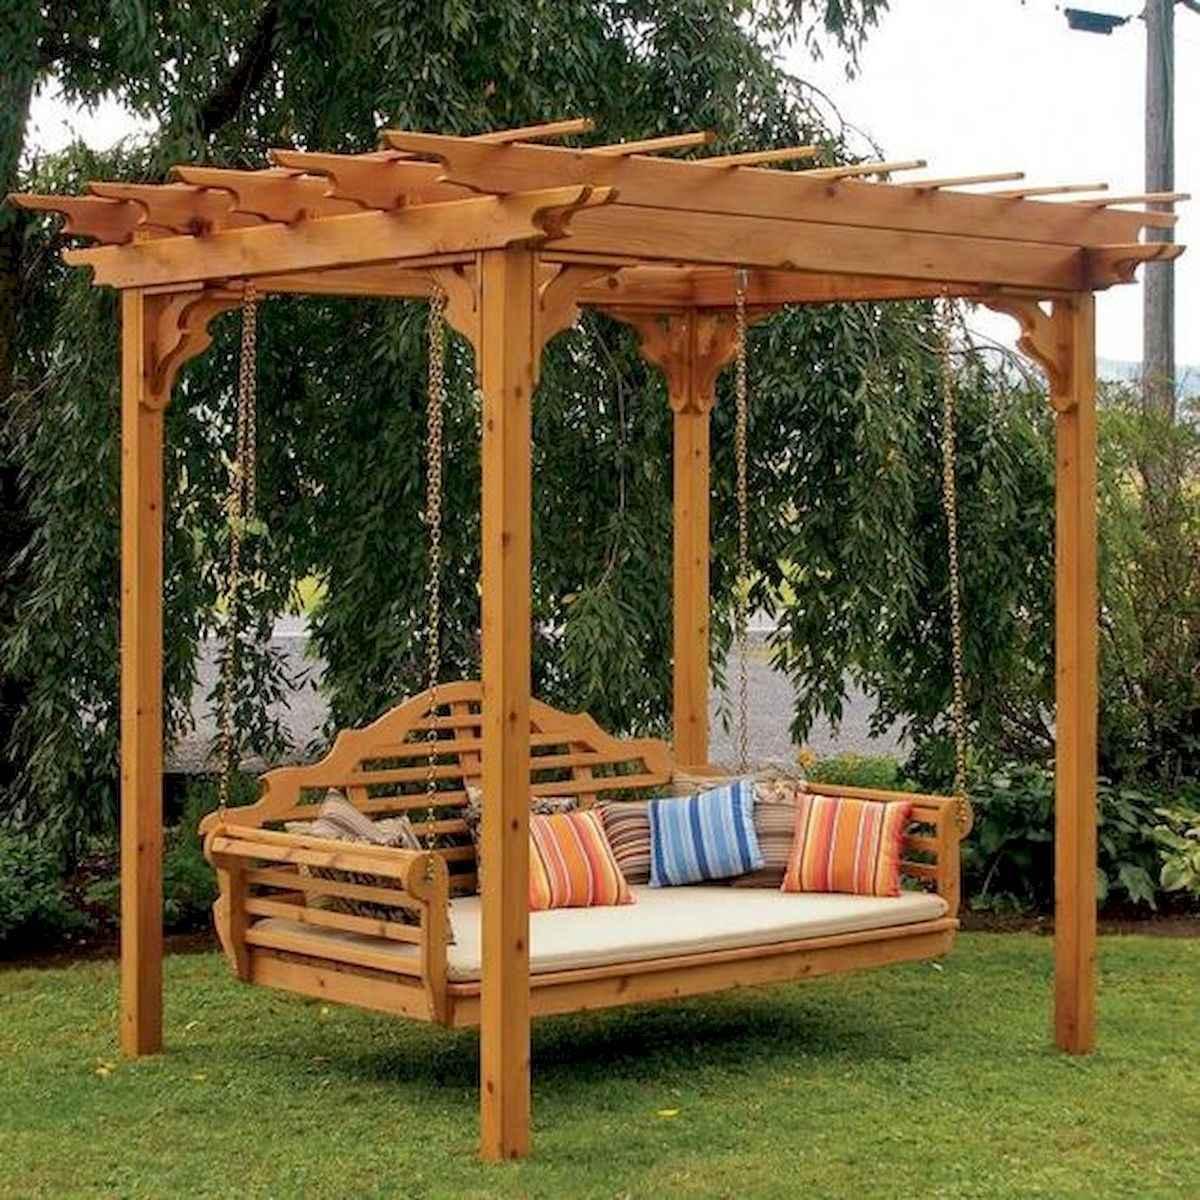 60 Amazing DIY Projects Otdoors Furniture Design Ideas (17)